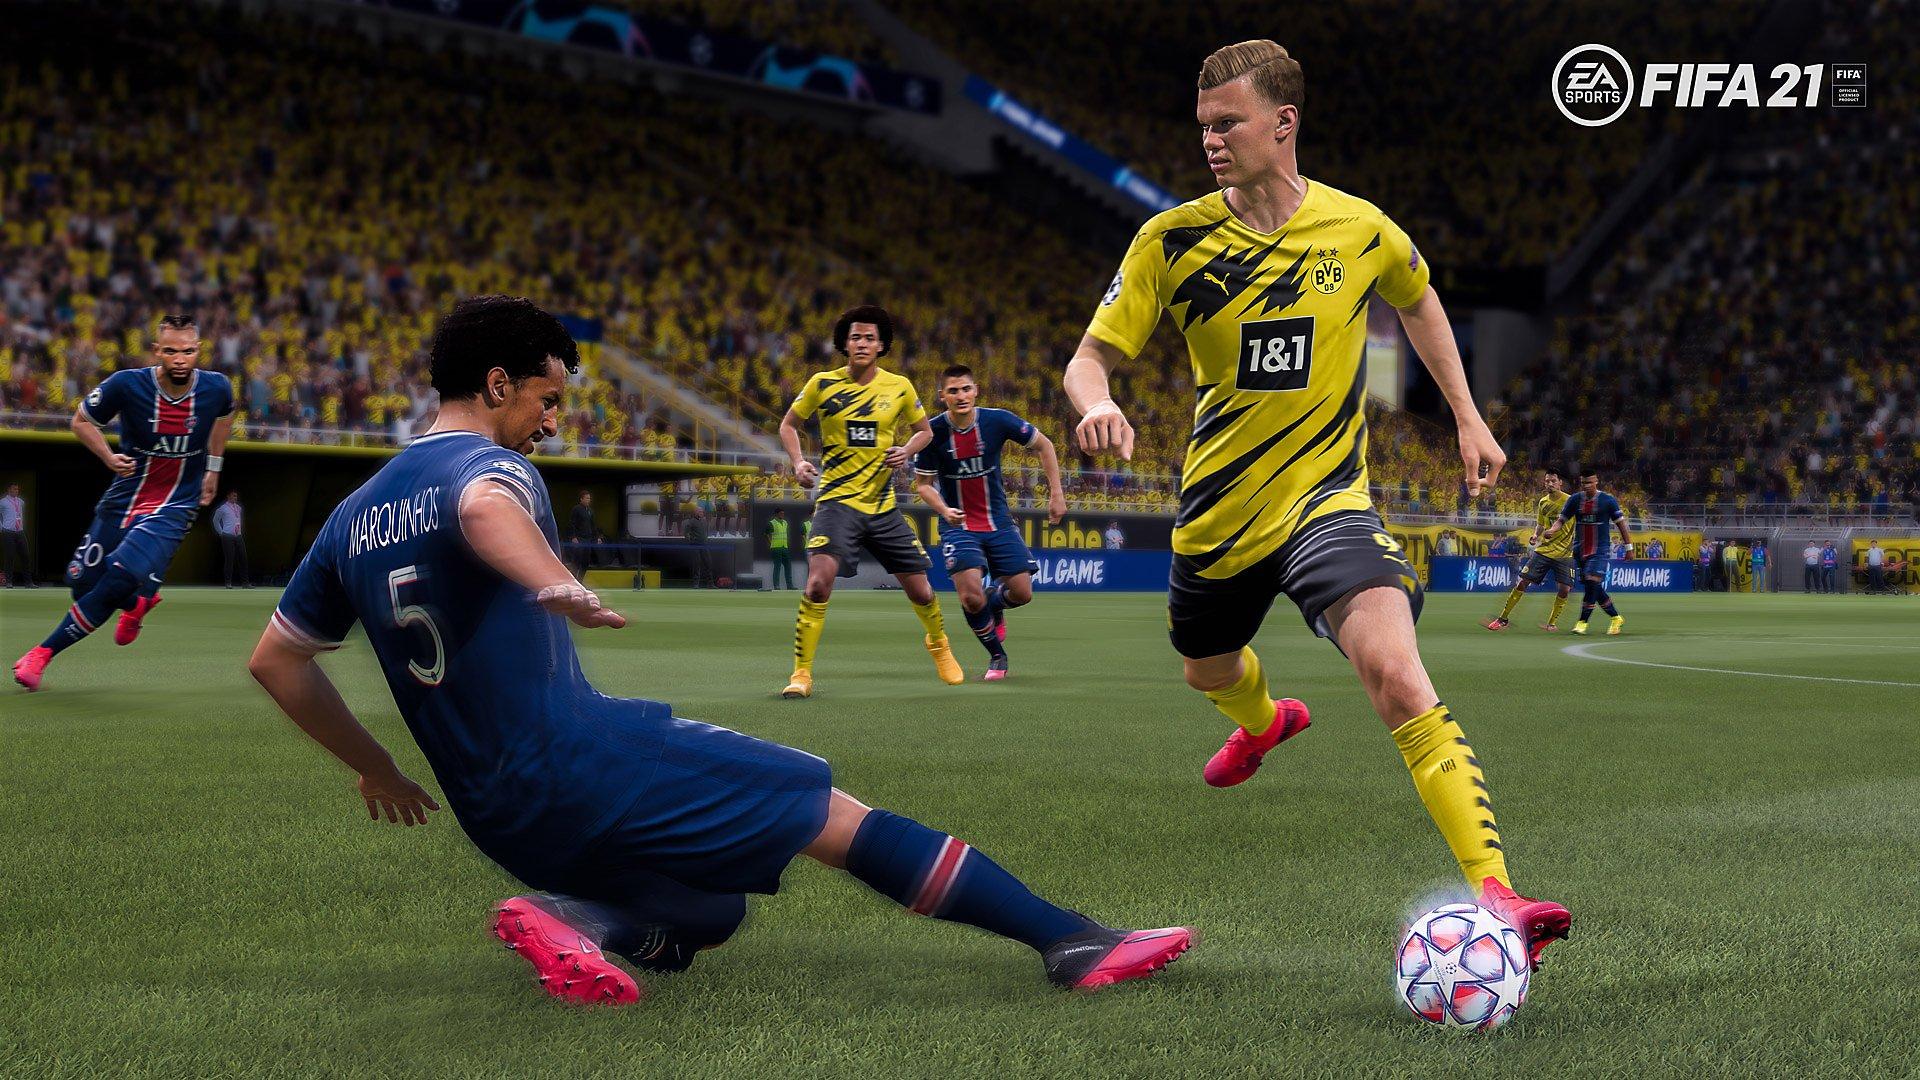 PS4 FIFA 21 Standard Edition 2